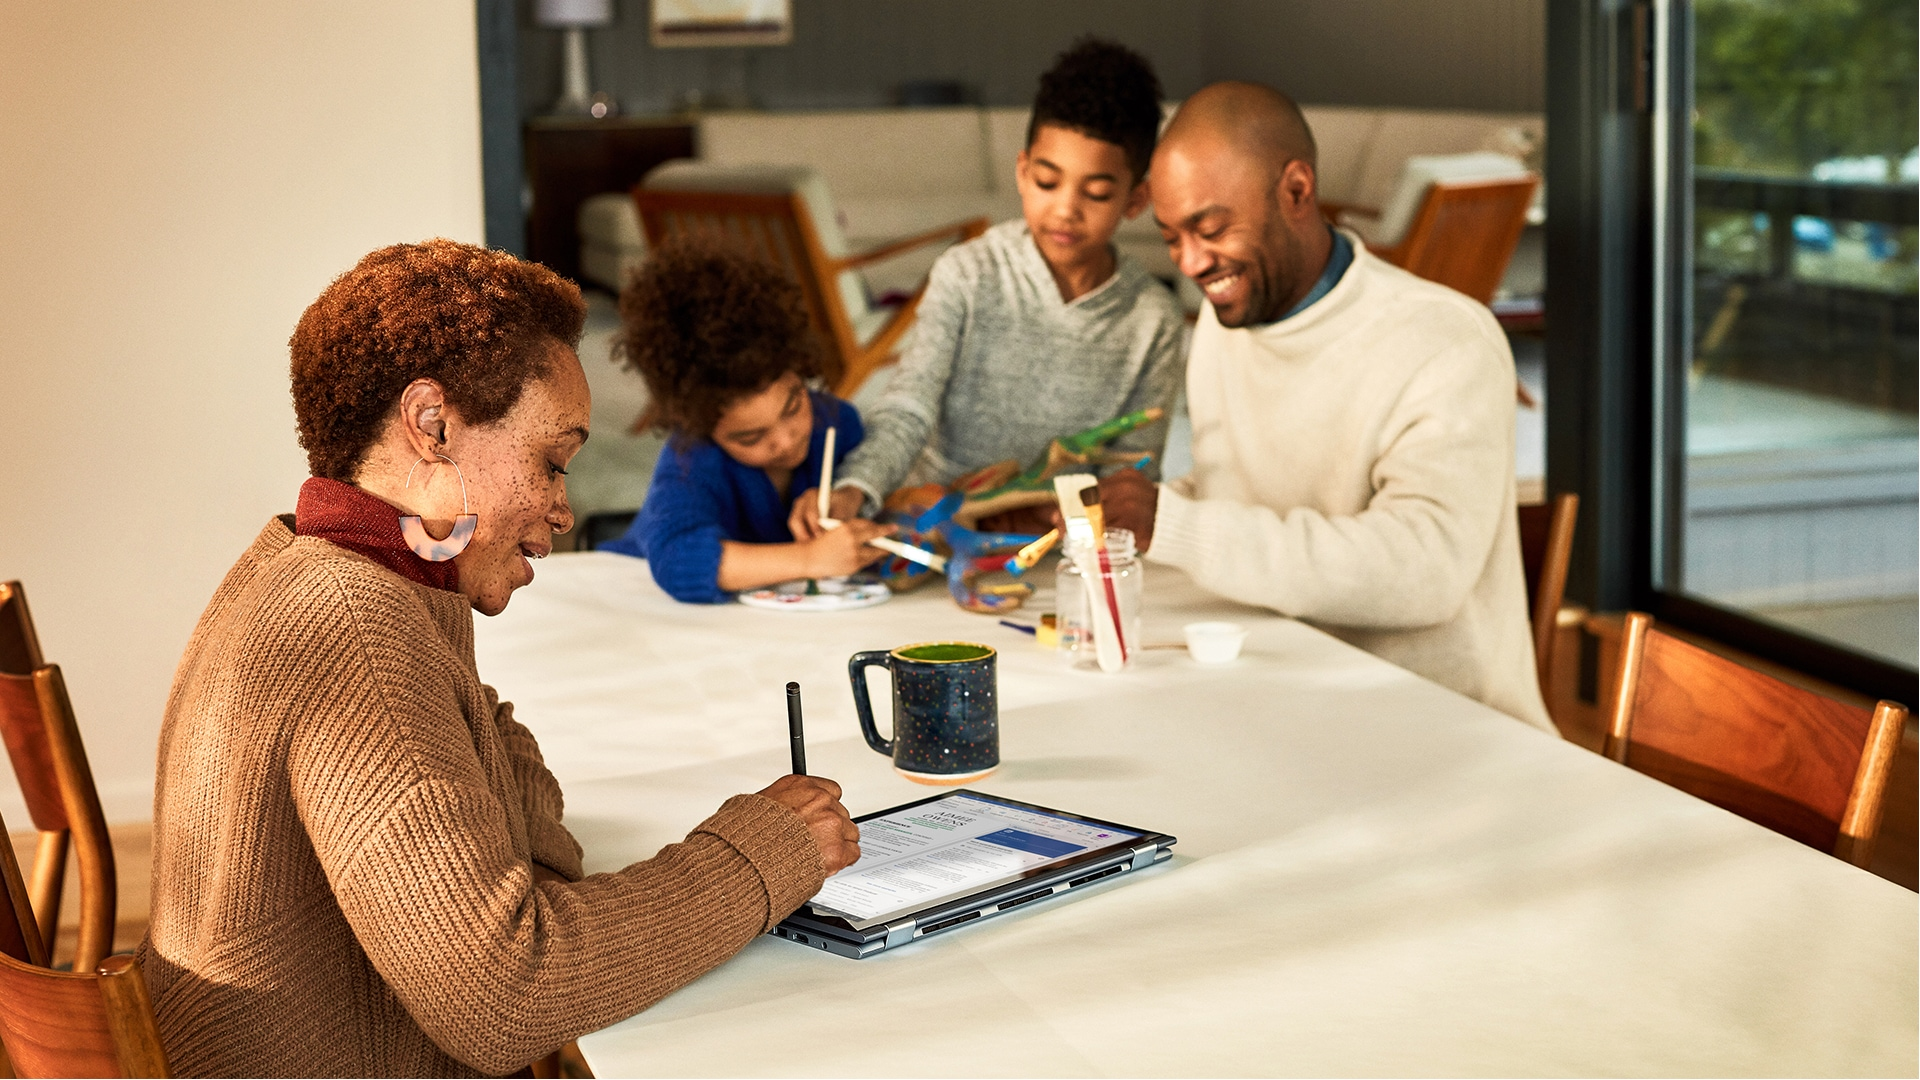 acheter office 365 famille microsoft store fr fr. Black Bedroom Furniture Sets. Home Design Ideas